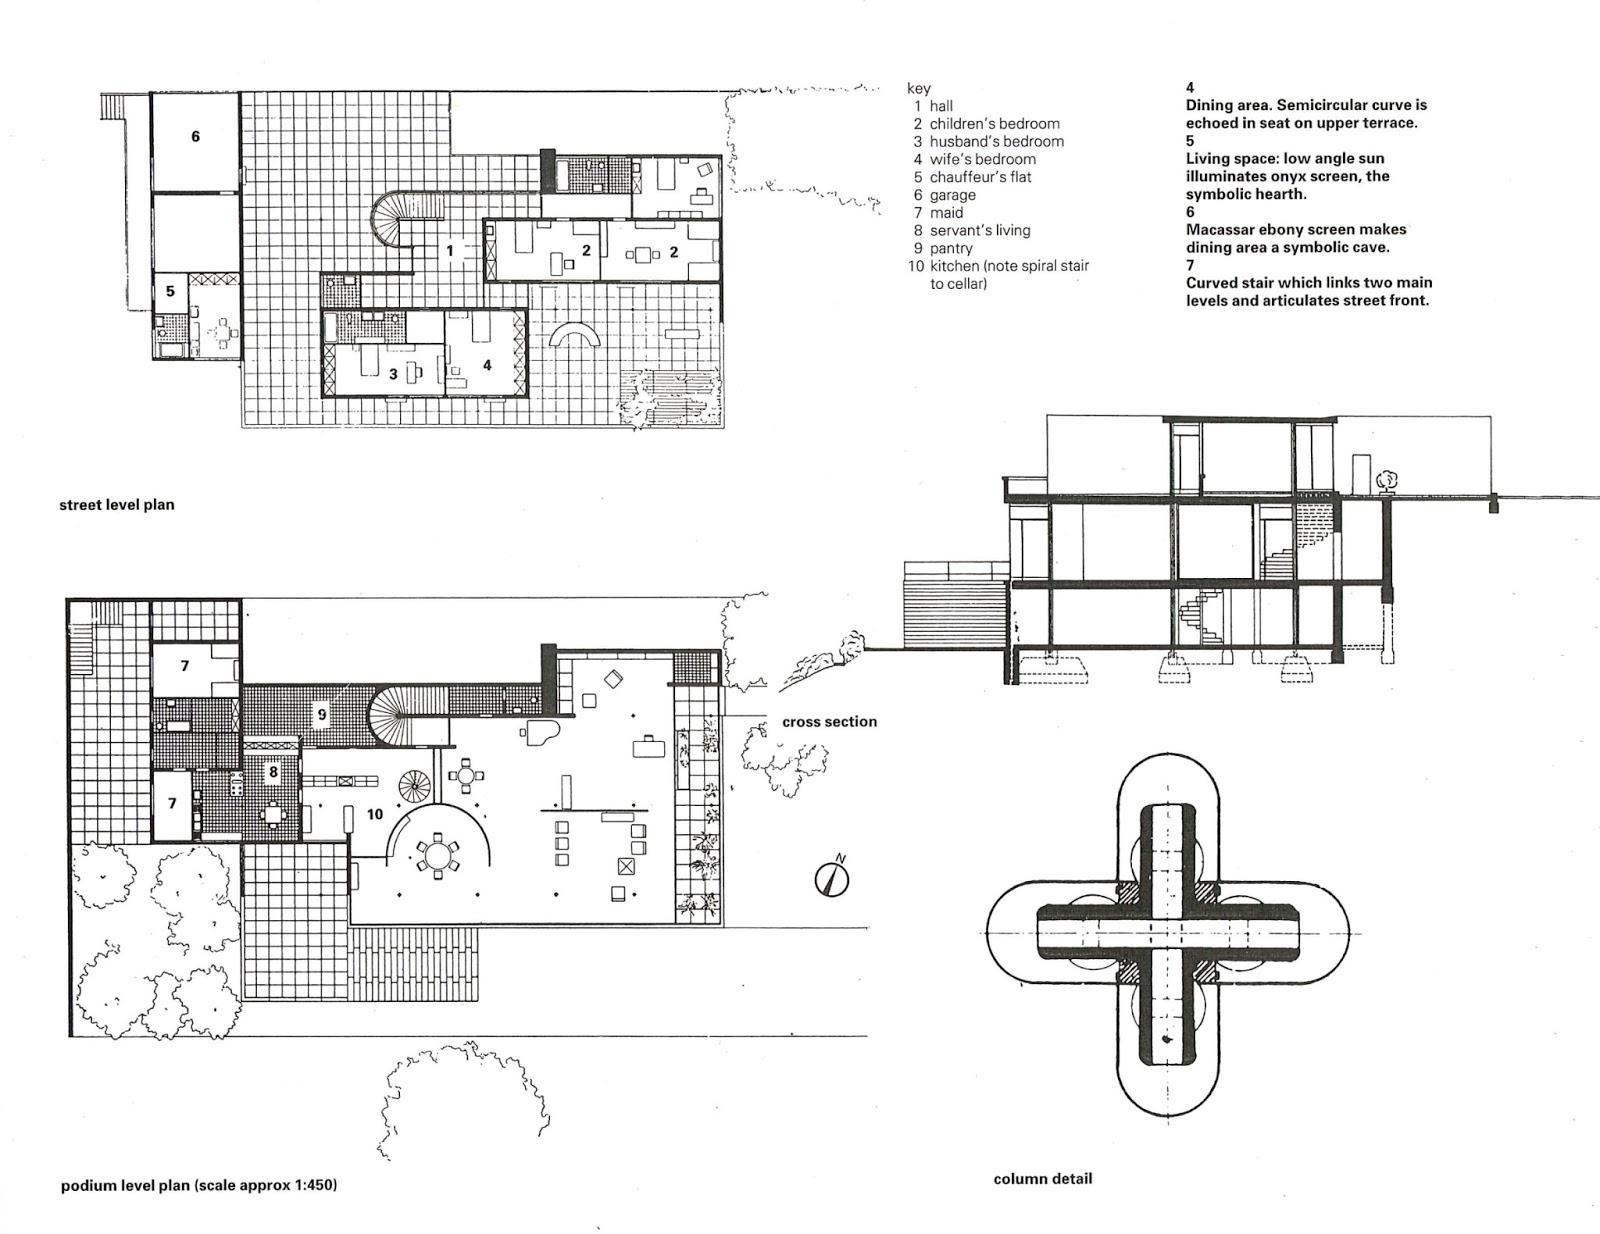 Architecture As Aesthetics Villa Tugendhat